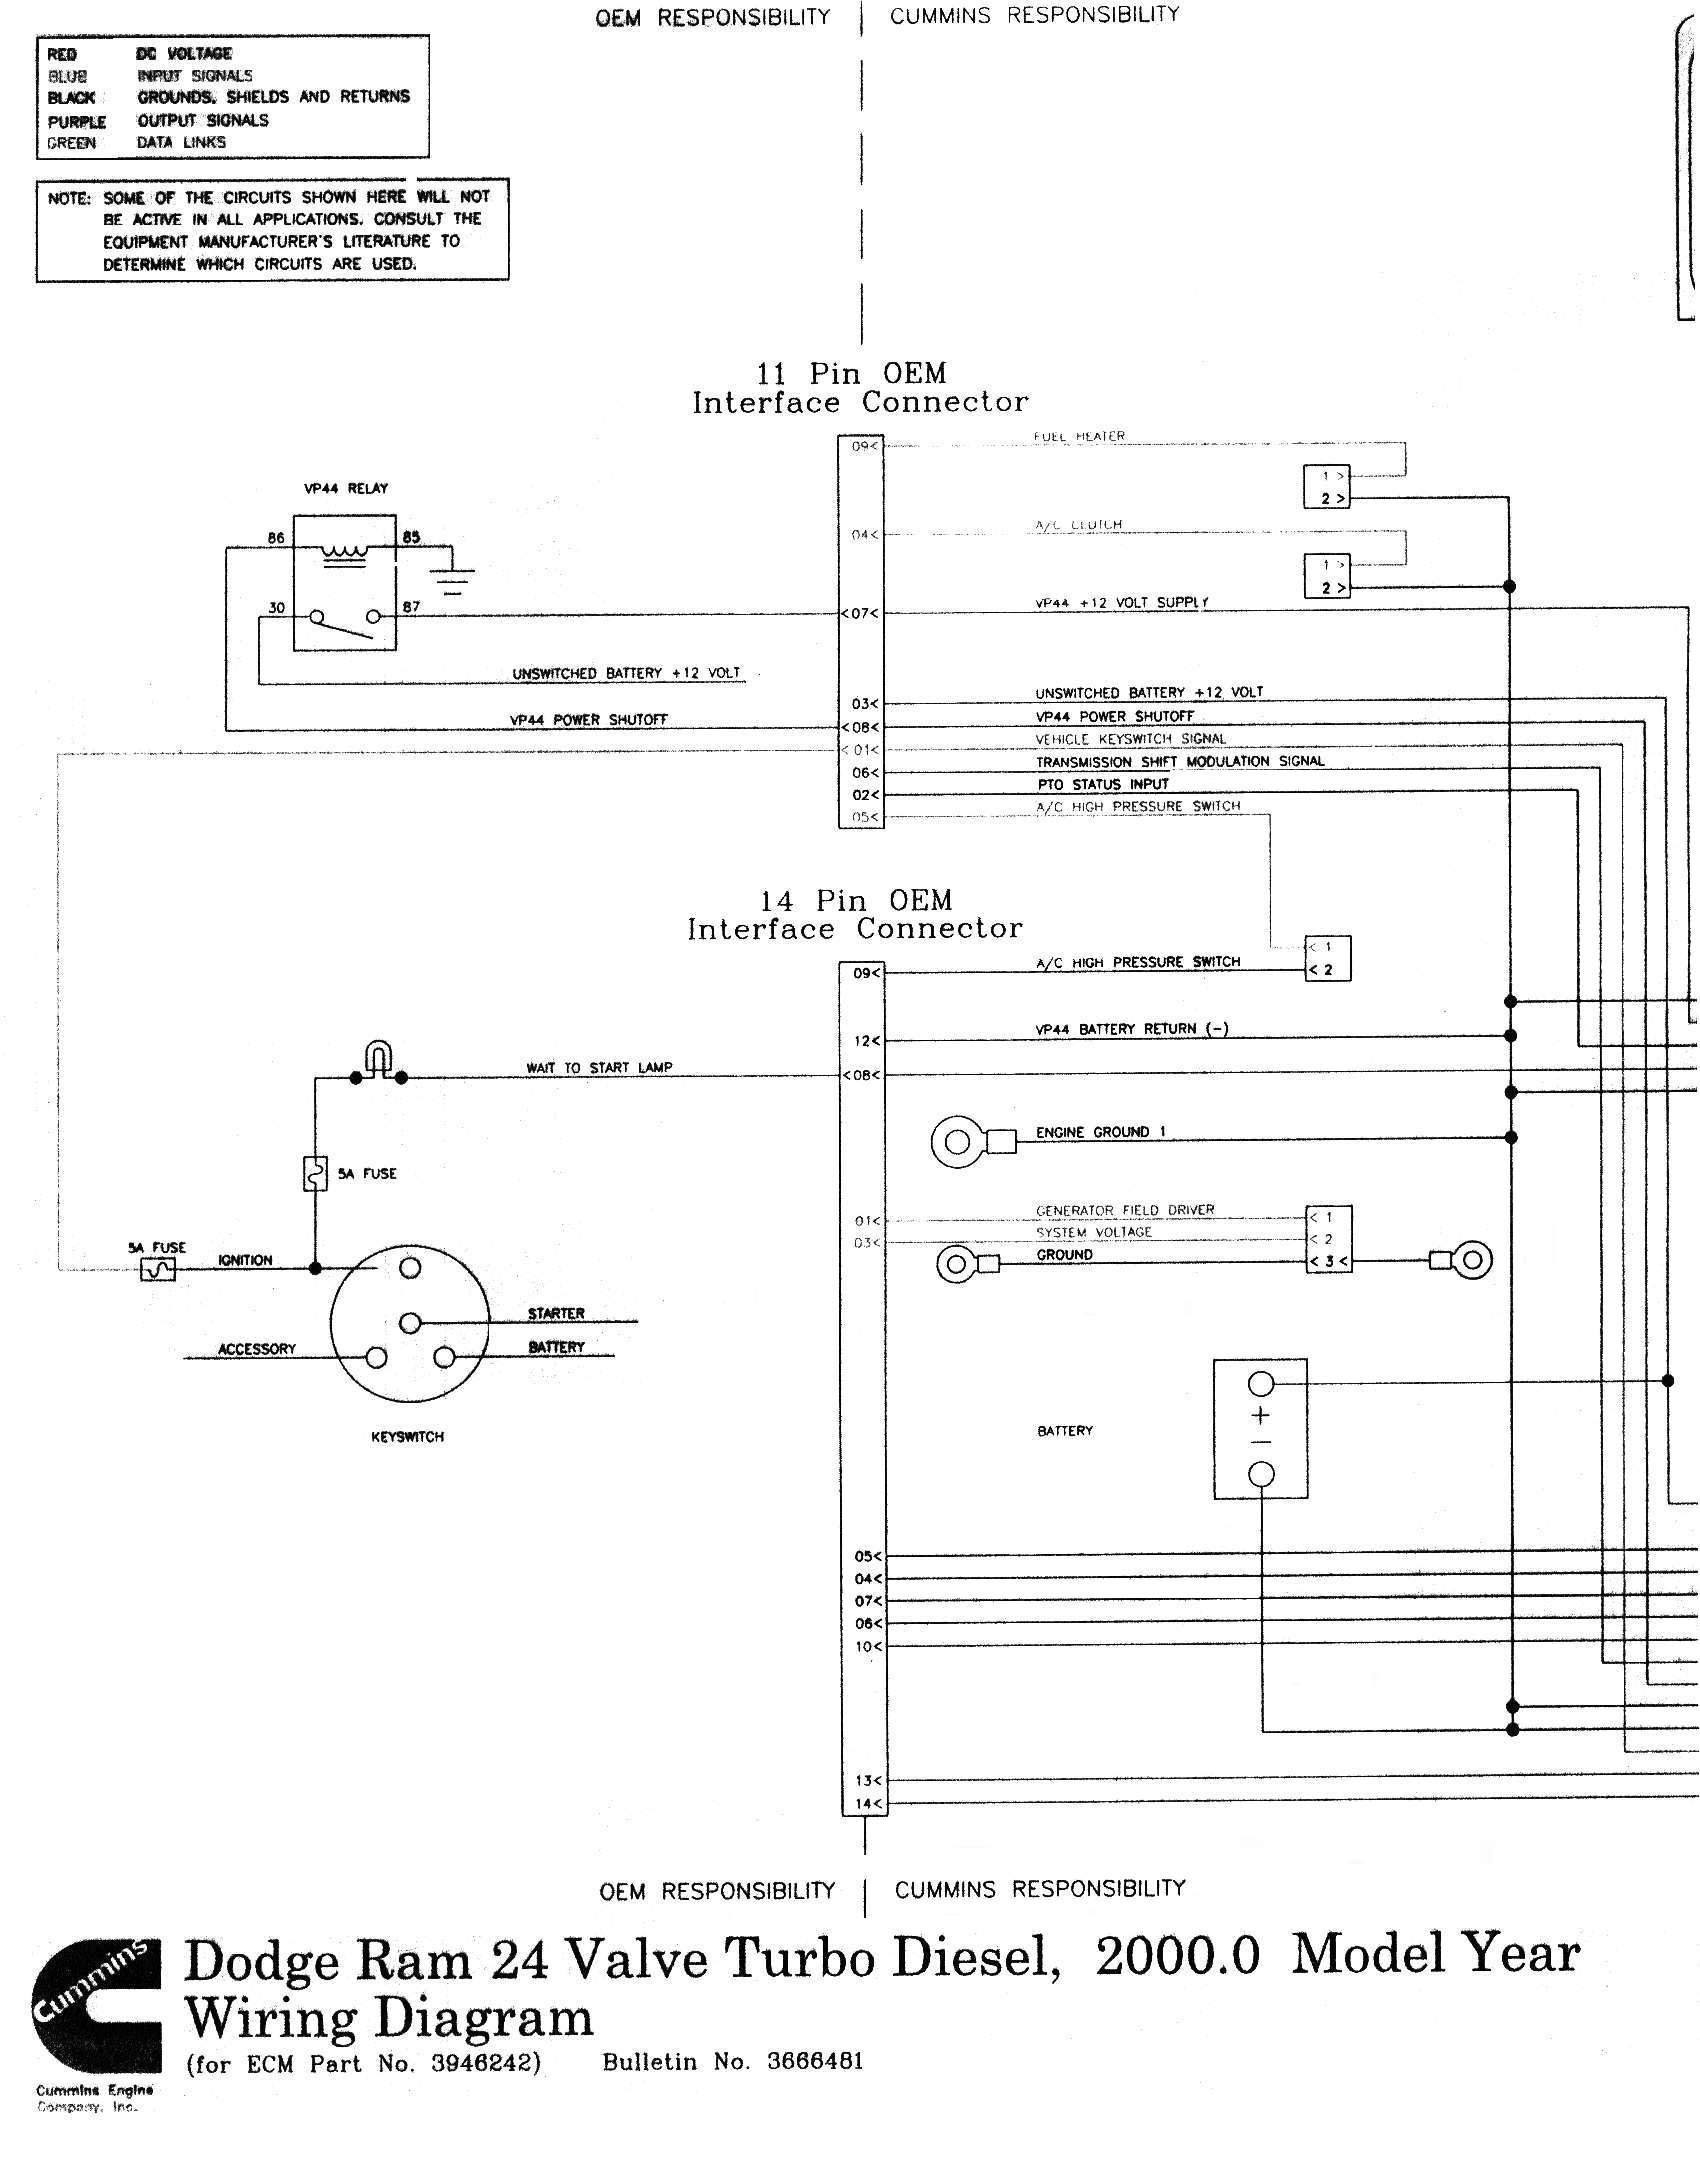 Dodge Ram 1500 Parts Diagram Dodge Ram Oem Parts Diagram Of Dodge Ram 1500 Parts Diagram